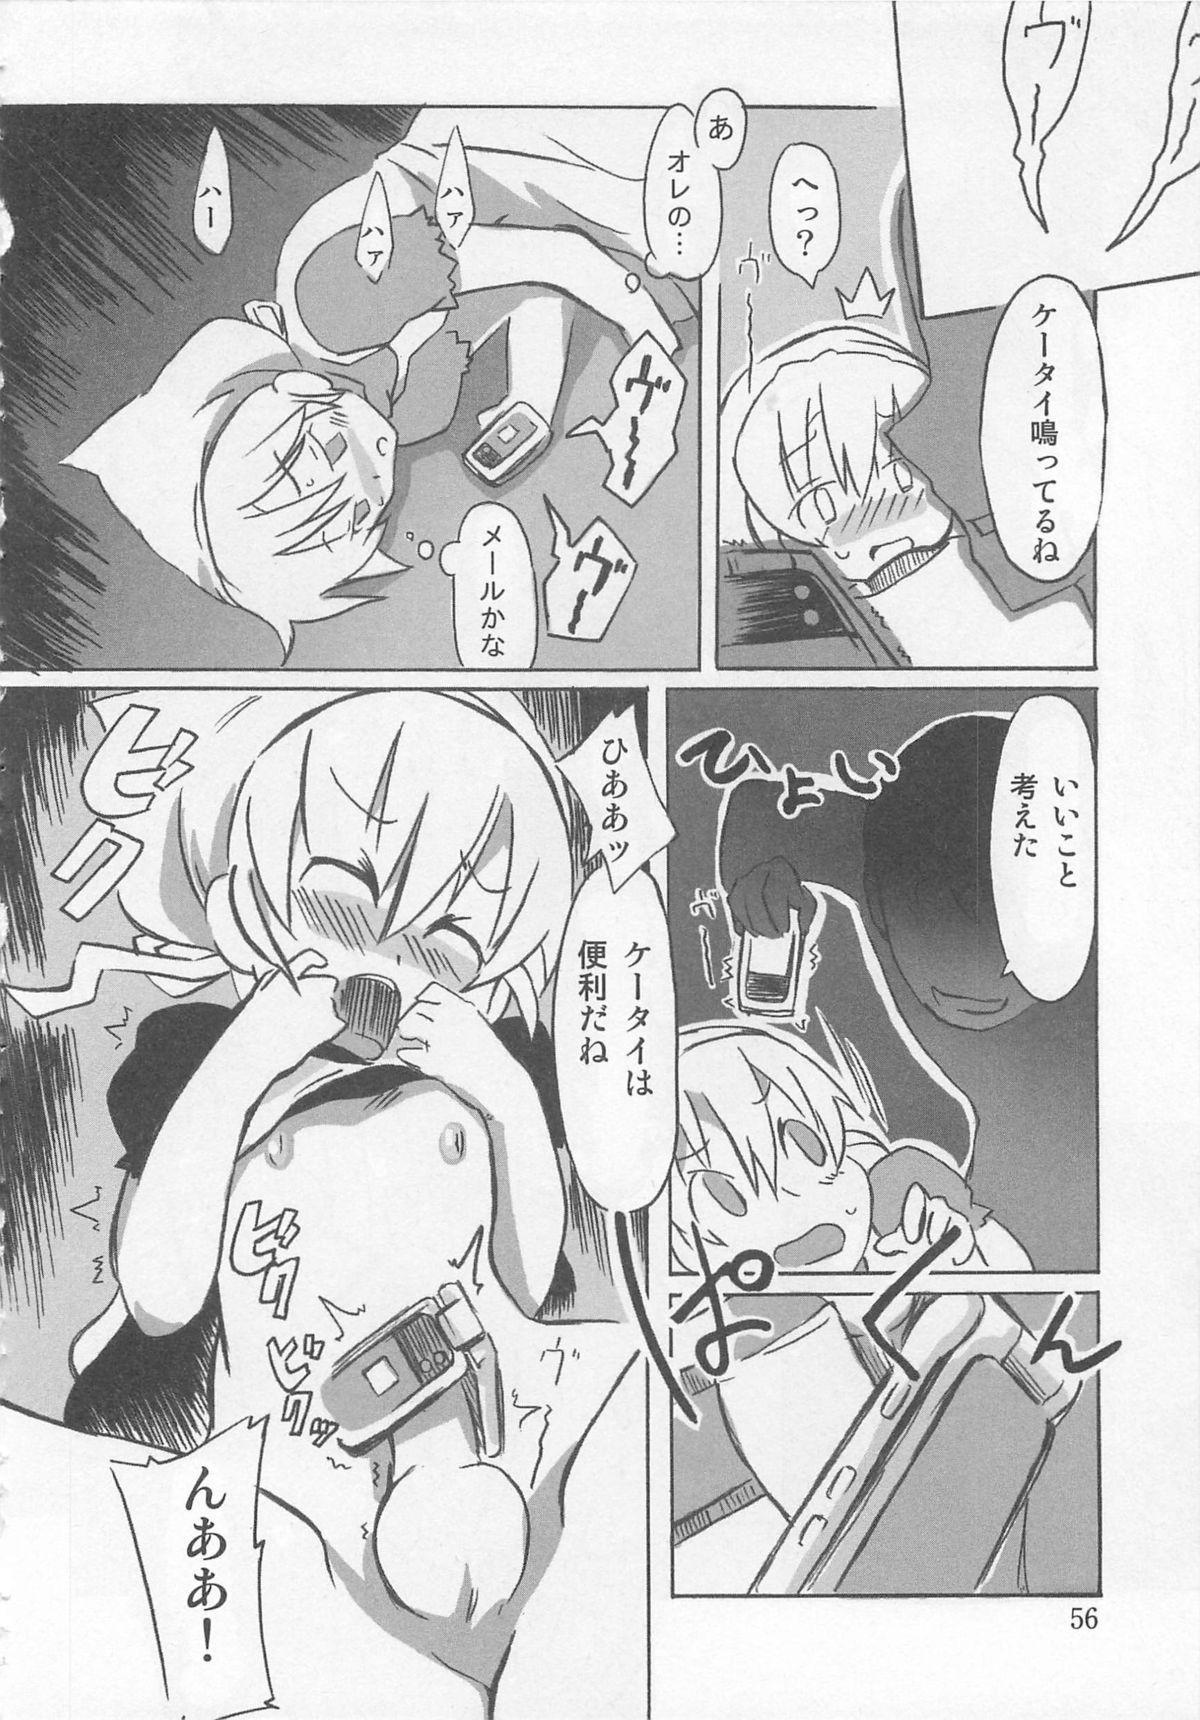 Otokonoko HEAVEN Vol. 02 Dokidoki Chikan Taiken 58